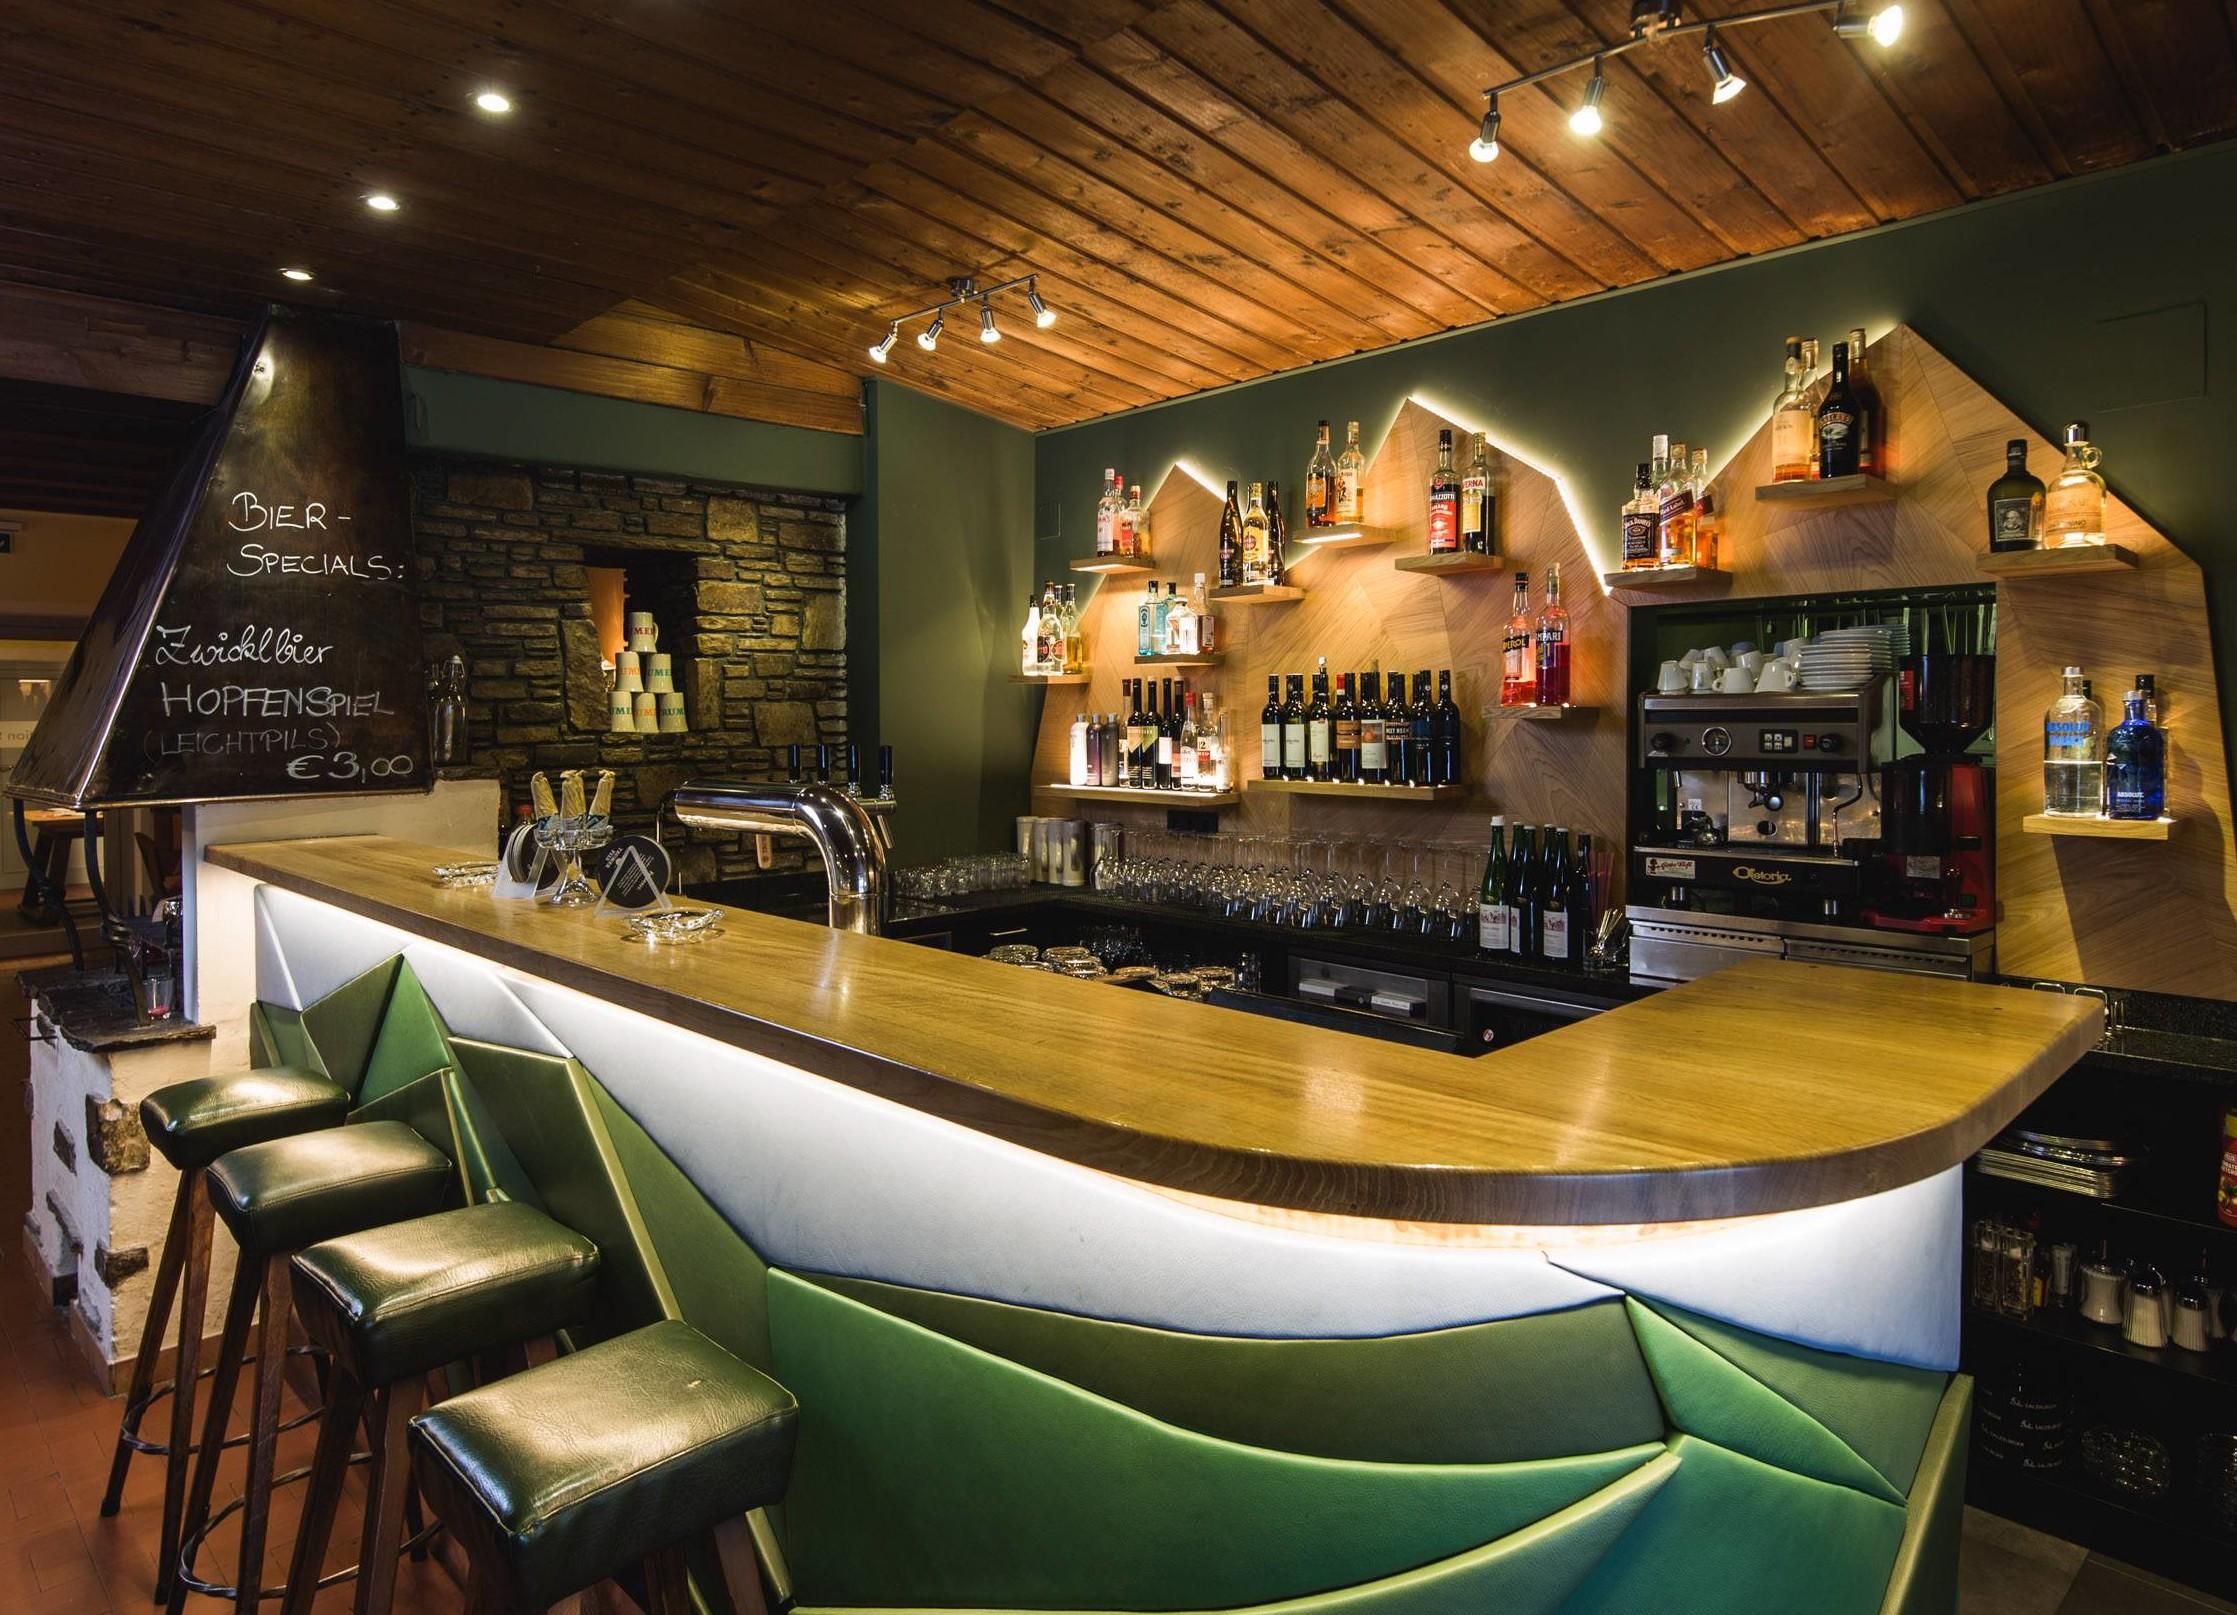 Bar-Theke im Gasthaus in Ebenau, Salzburg Umgebung